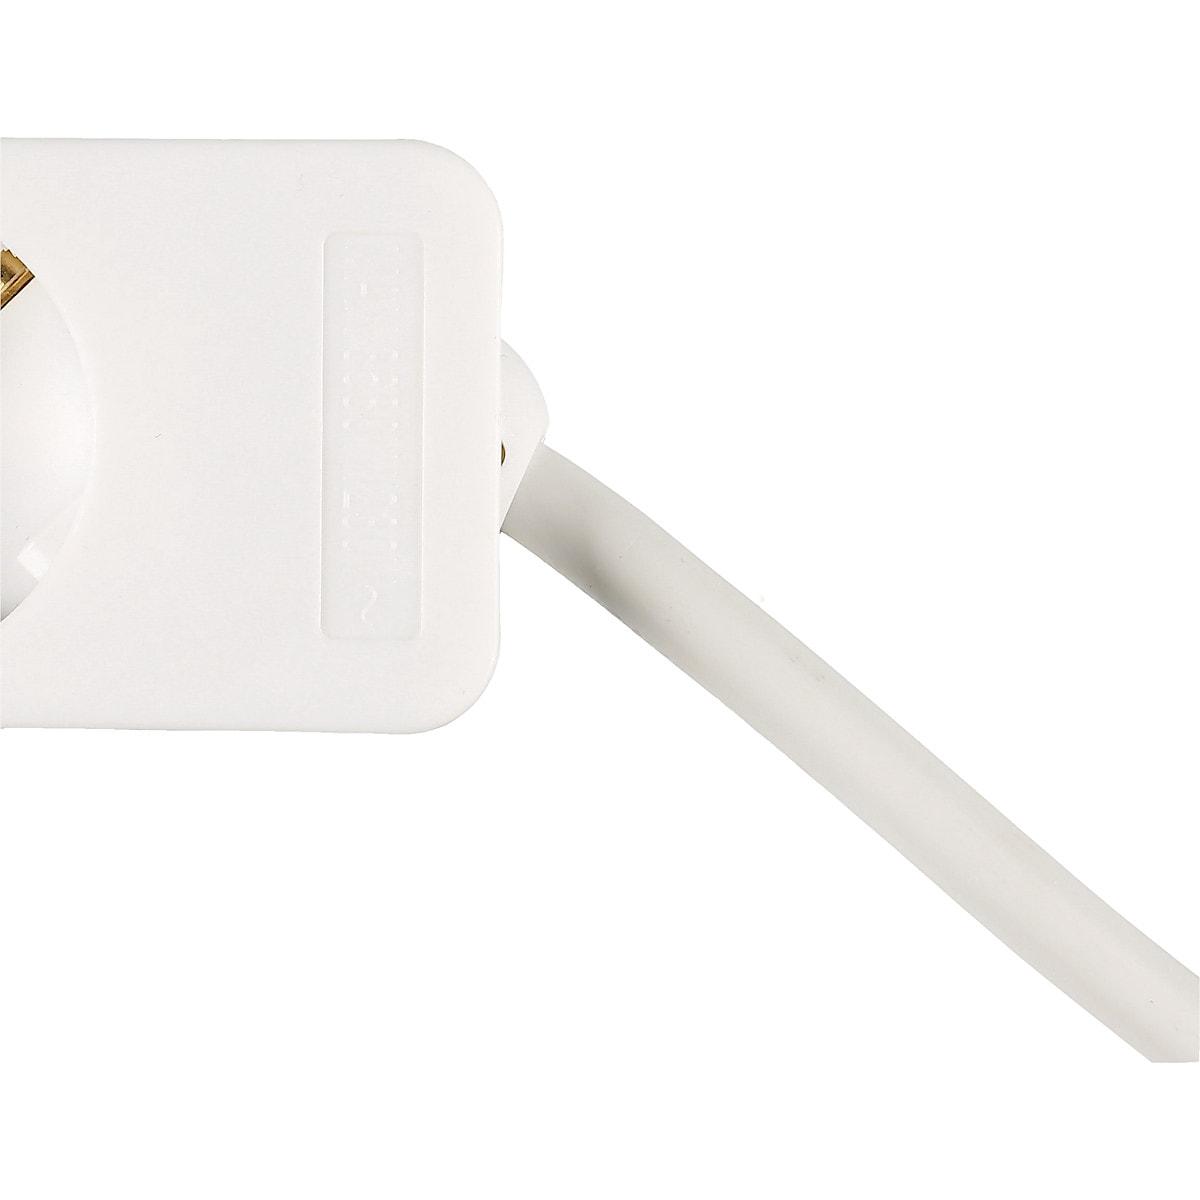 3-veis grenuttak 1,4 m kabel